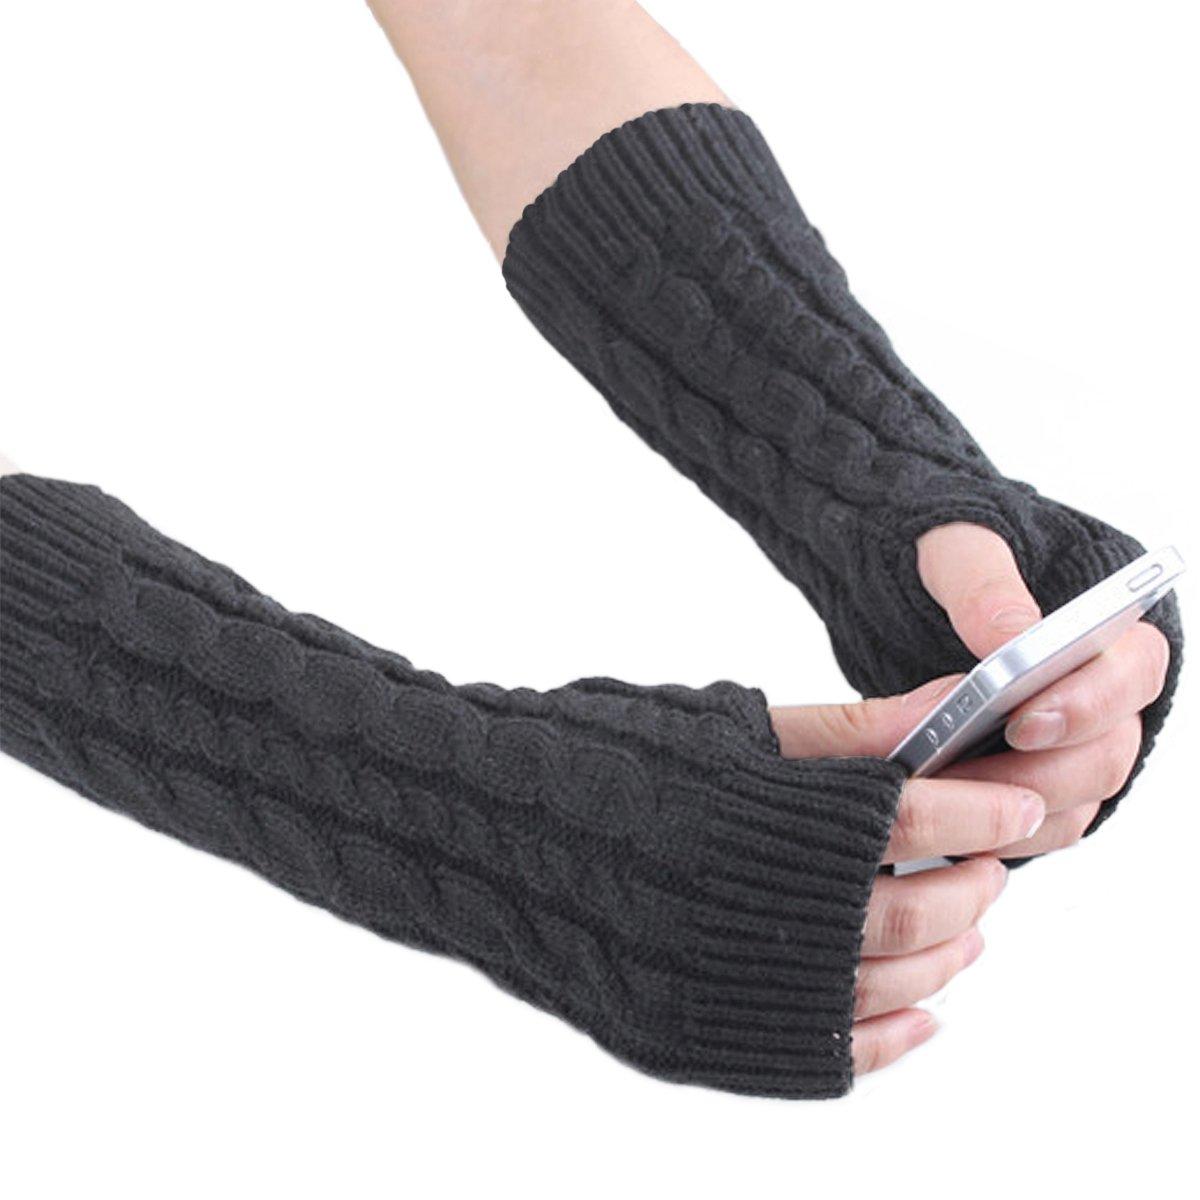 Aisa Womens Knitted Crochet Long Gloves Winter Warm Arm Fingerless Design Thumb Hole Knitted Gloves Mittens Soft Stretchy Warmer (Dark Grey)